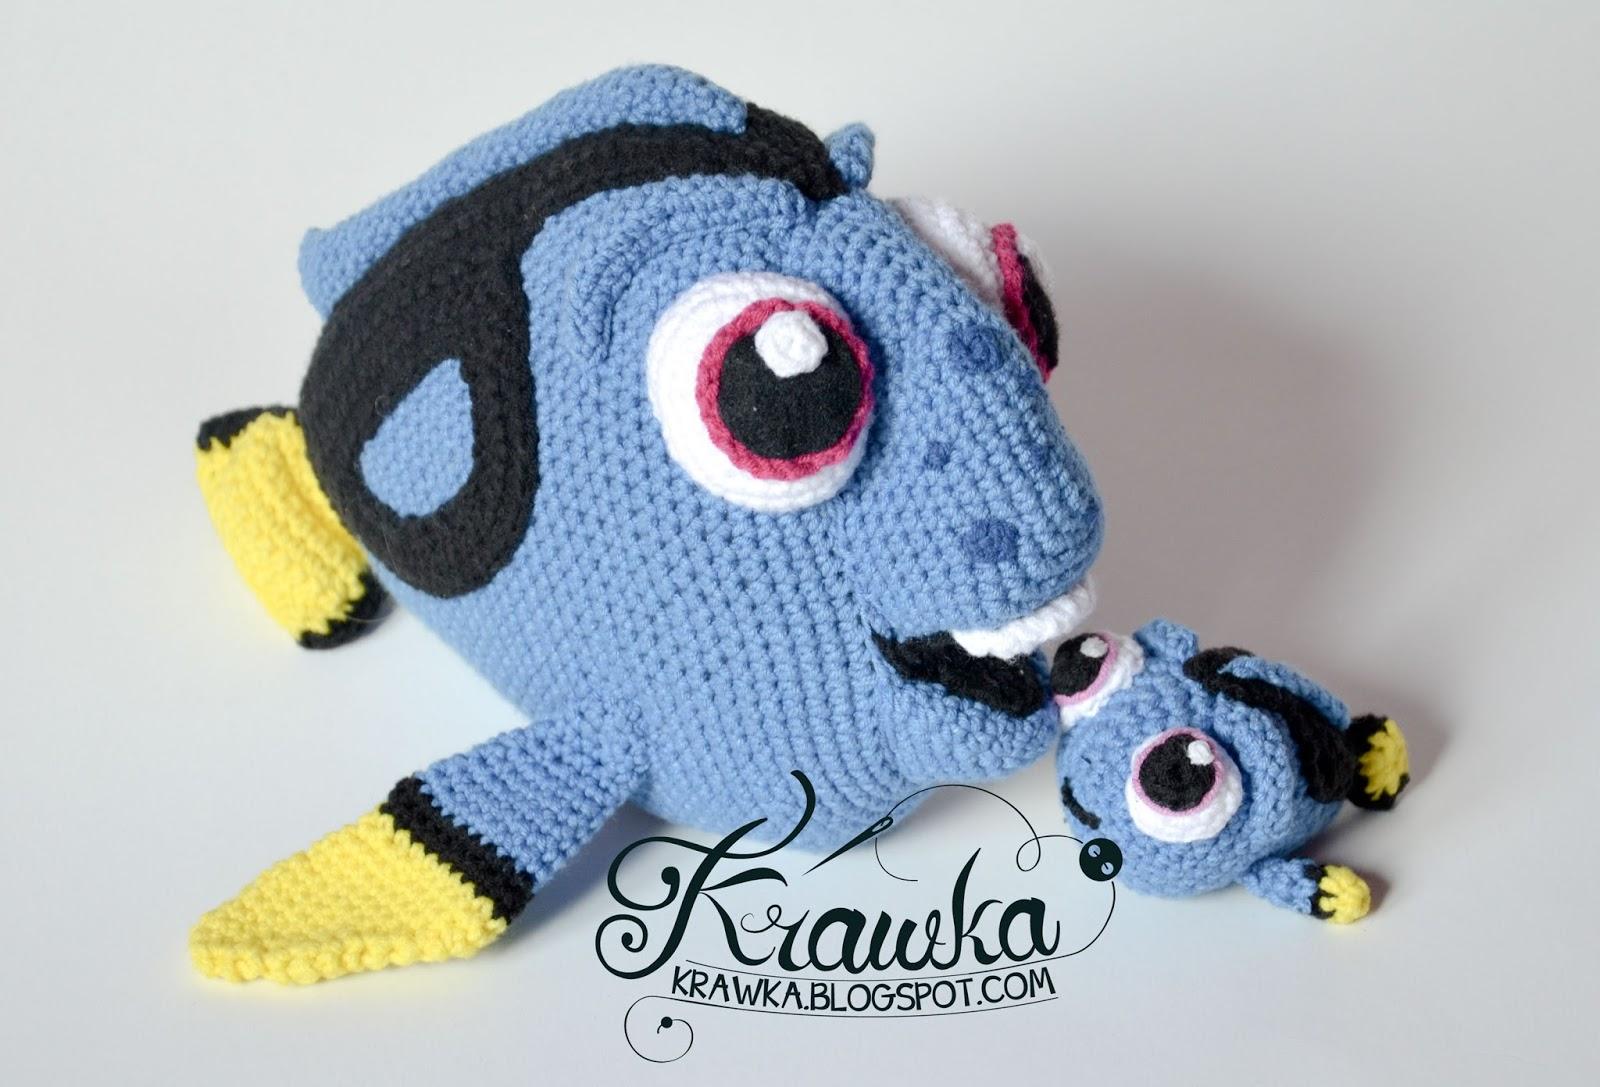 Free Amigurumi Disney Patterns : Krawka: baby dory crochet free pattern